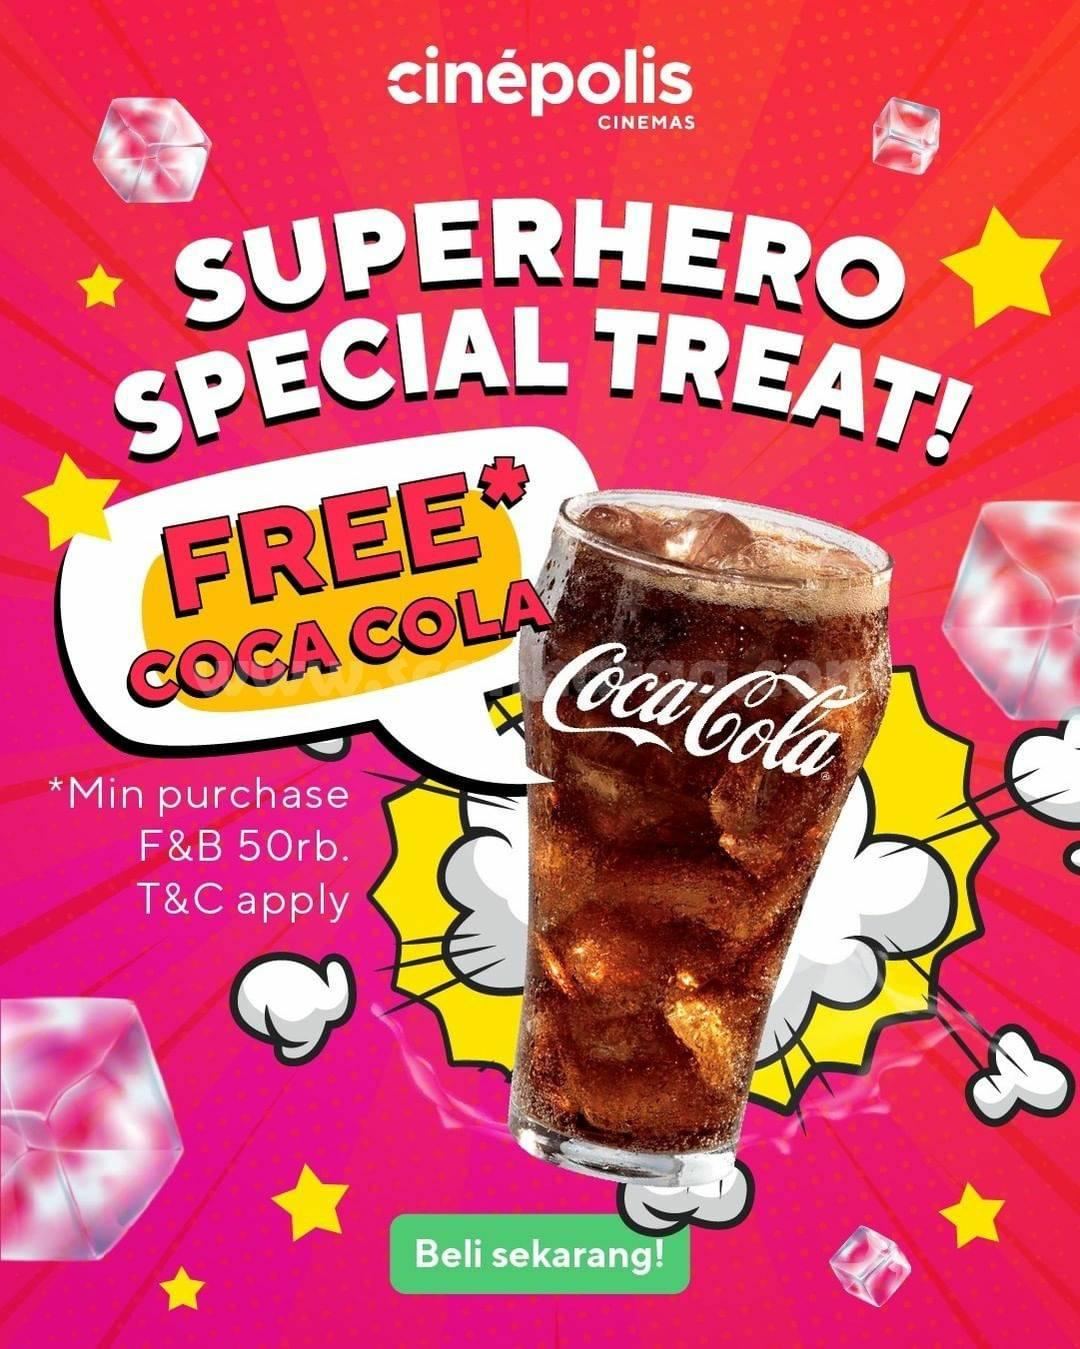 Promo CINEPOLIS Super Hero Special Treat – GRATIS Coca Cola tiap beli F&B Min. Rp 50K